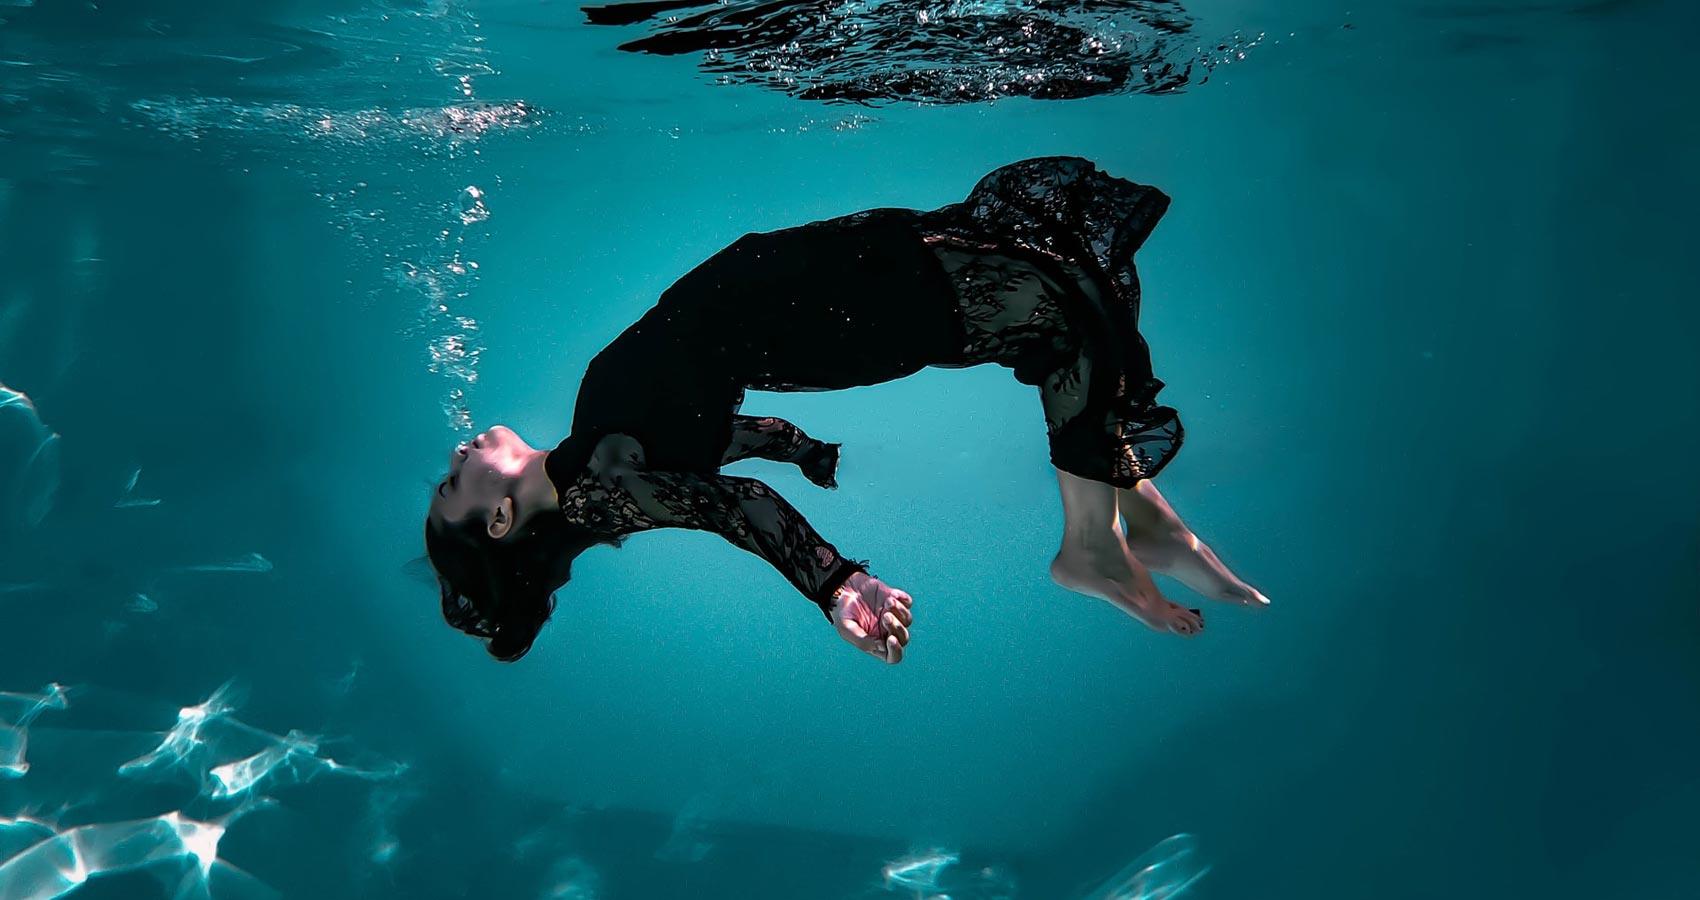 Of The Sea, poetic prose by Arlene Antoinette at Spillwords.com